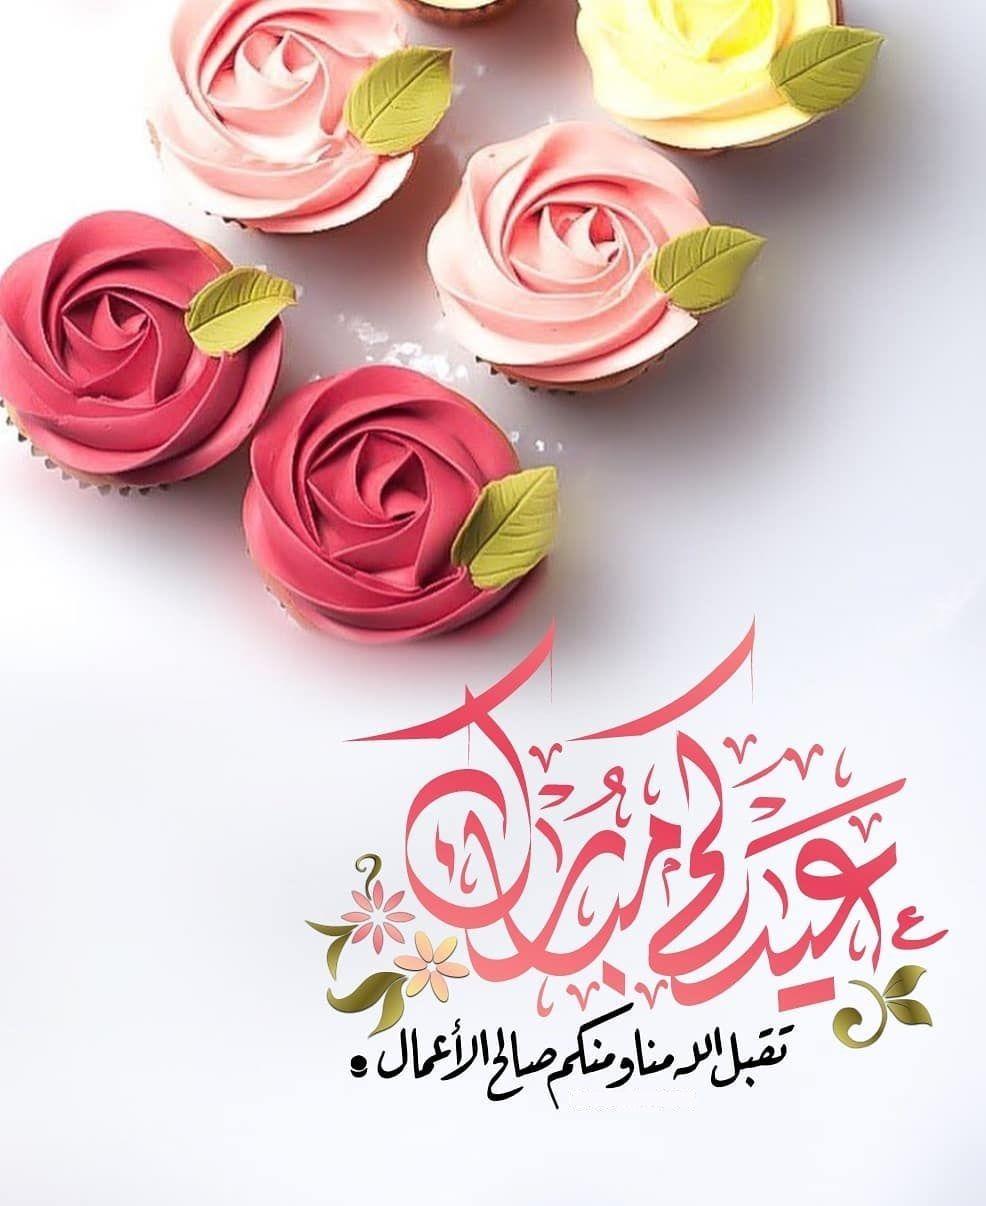 Pin By Orphan80 On كلام جميل Eid Greetings Eid Mubarak Stickers Eid Cards